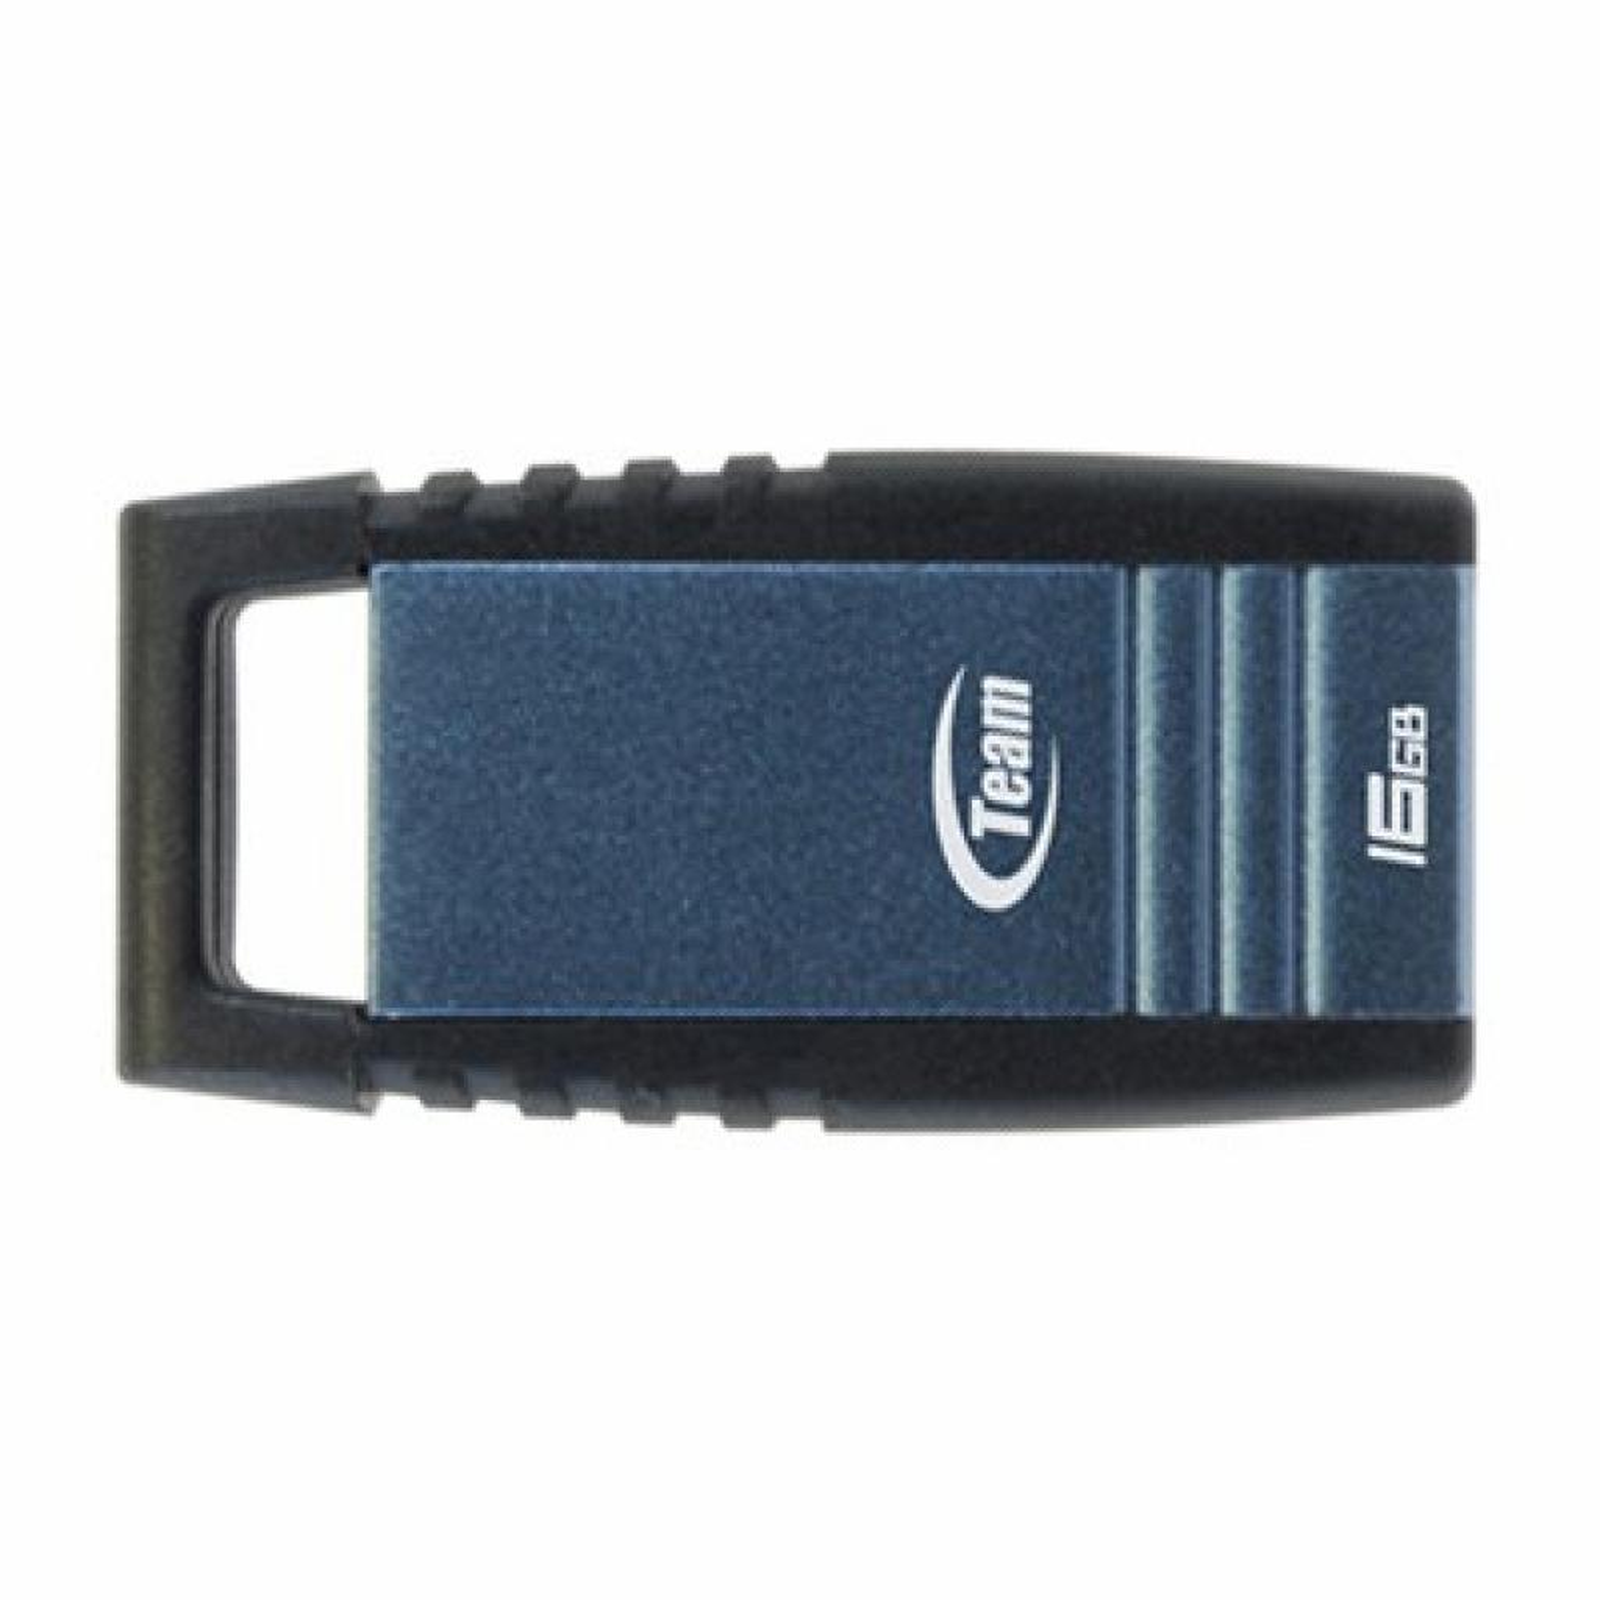 USB флеш накопитель Team 16Gb C092 grey (TG016GC092AX)